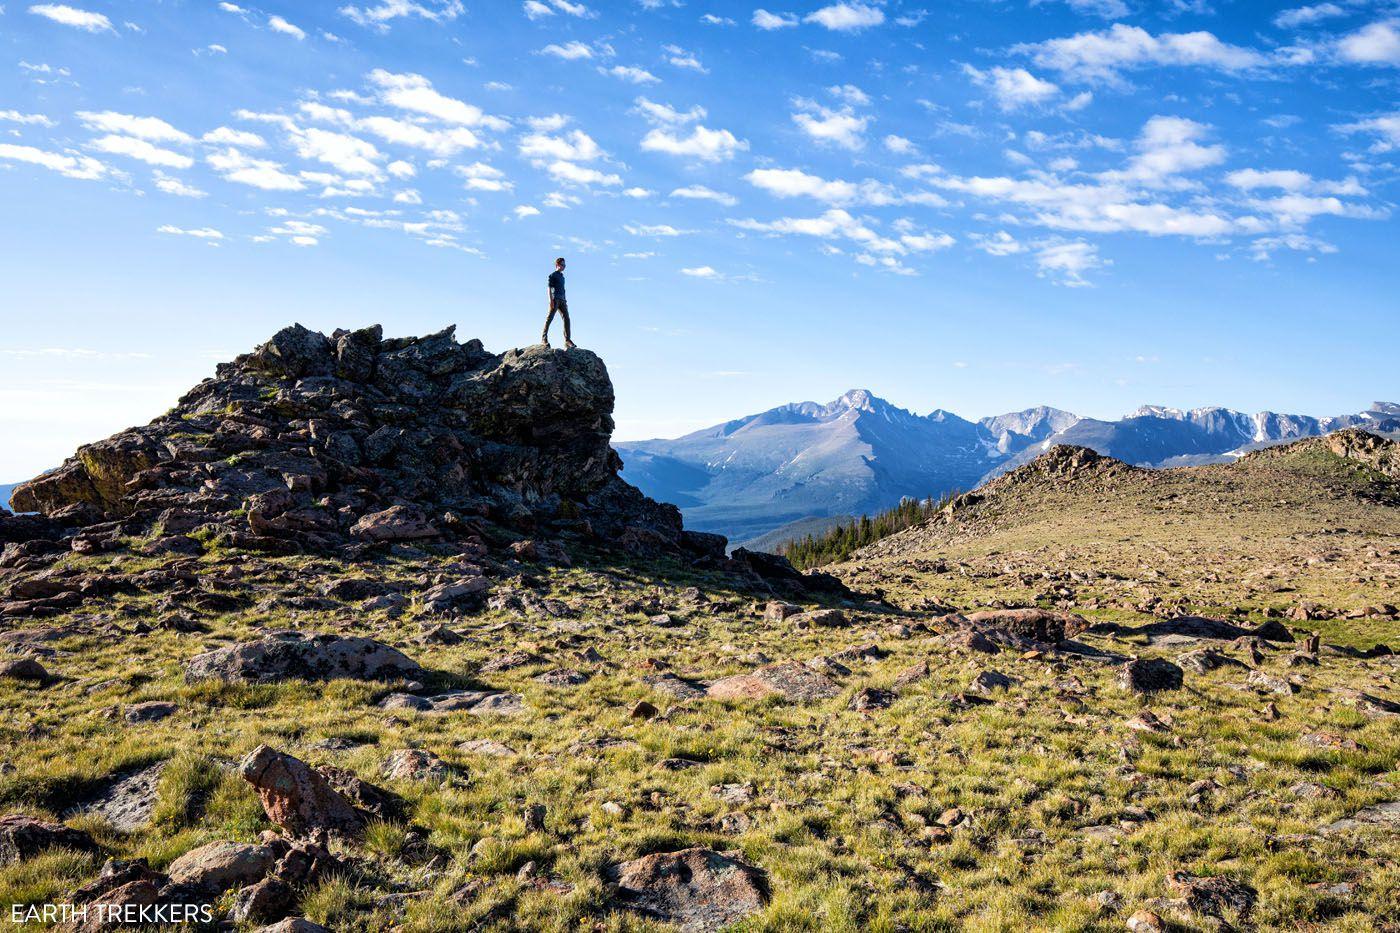 Best Hikes in RMNP